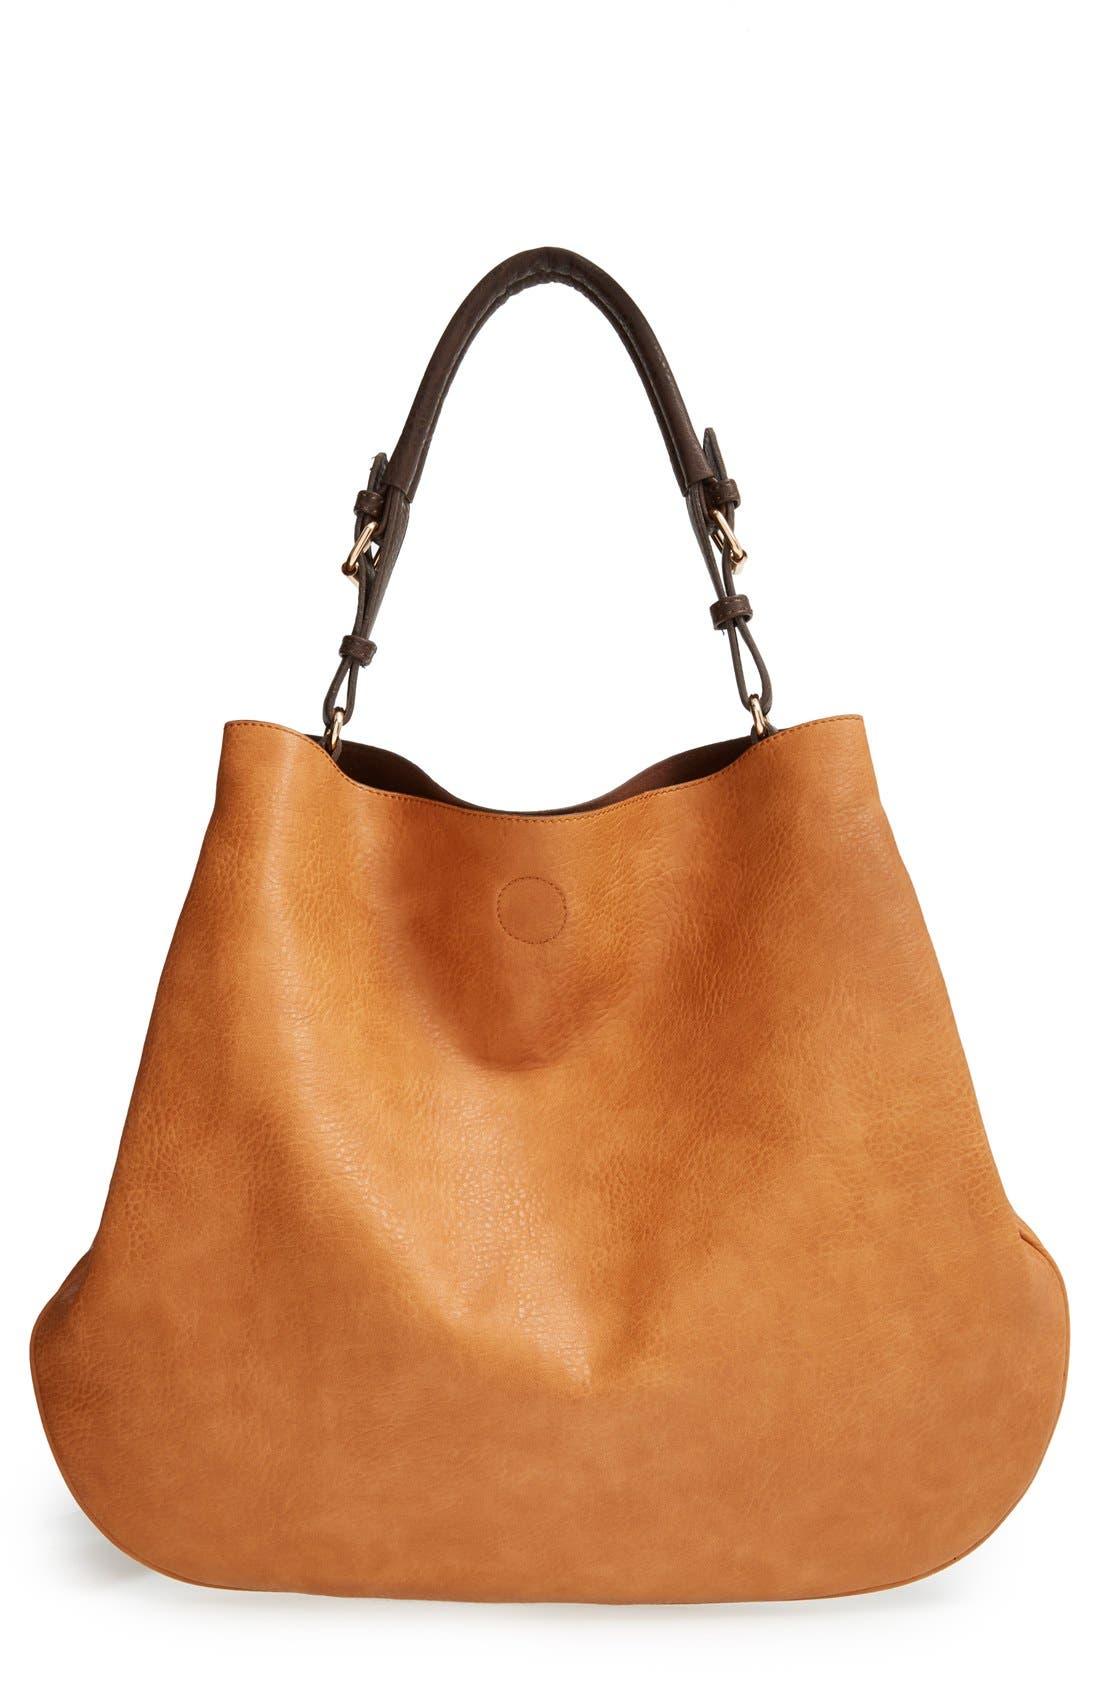 'Capri' Faux Leather Tote,                             Main thumbnail 1, color,                             200